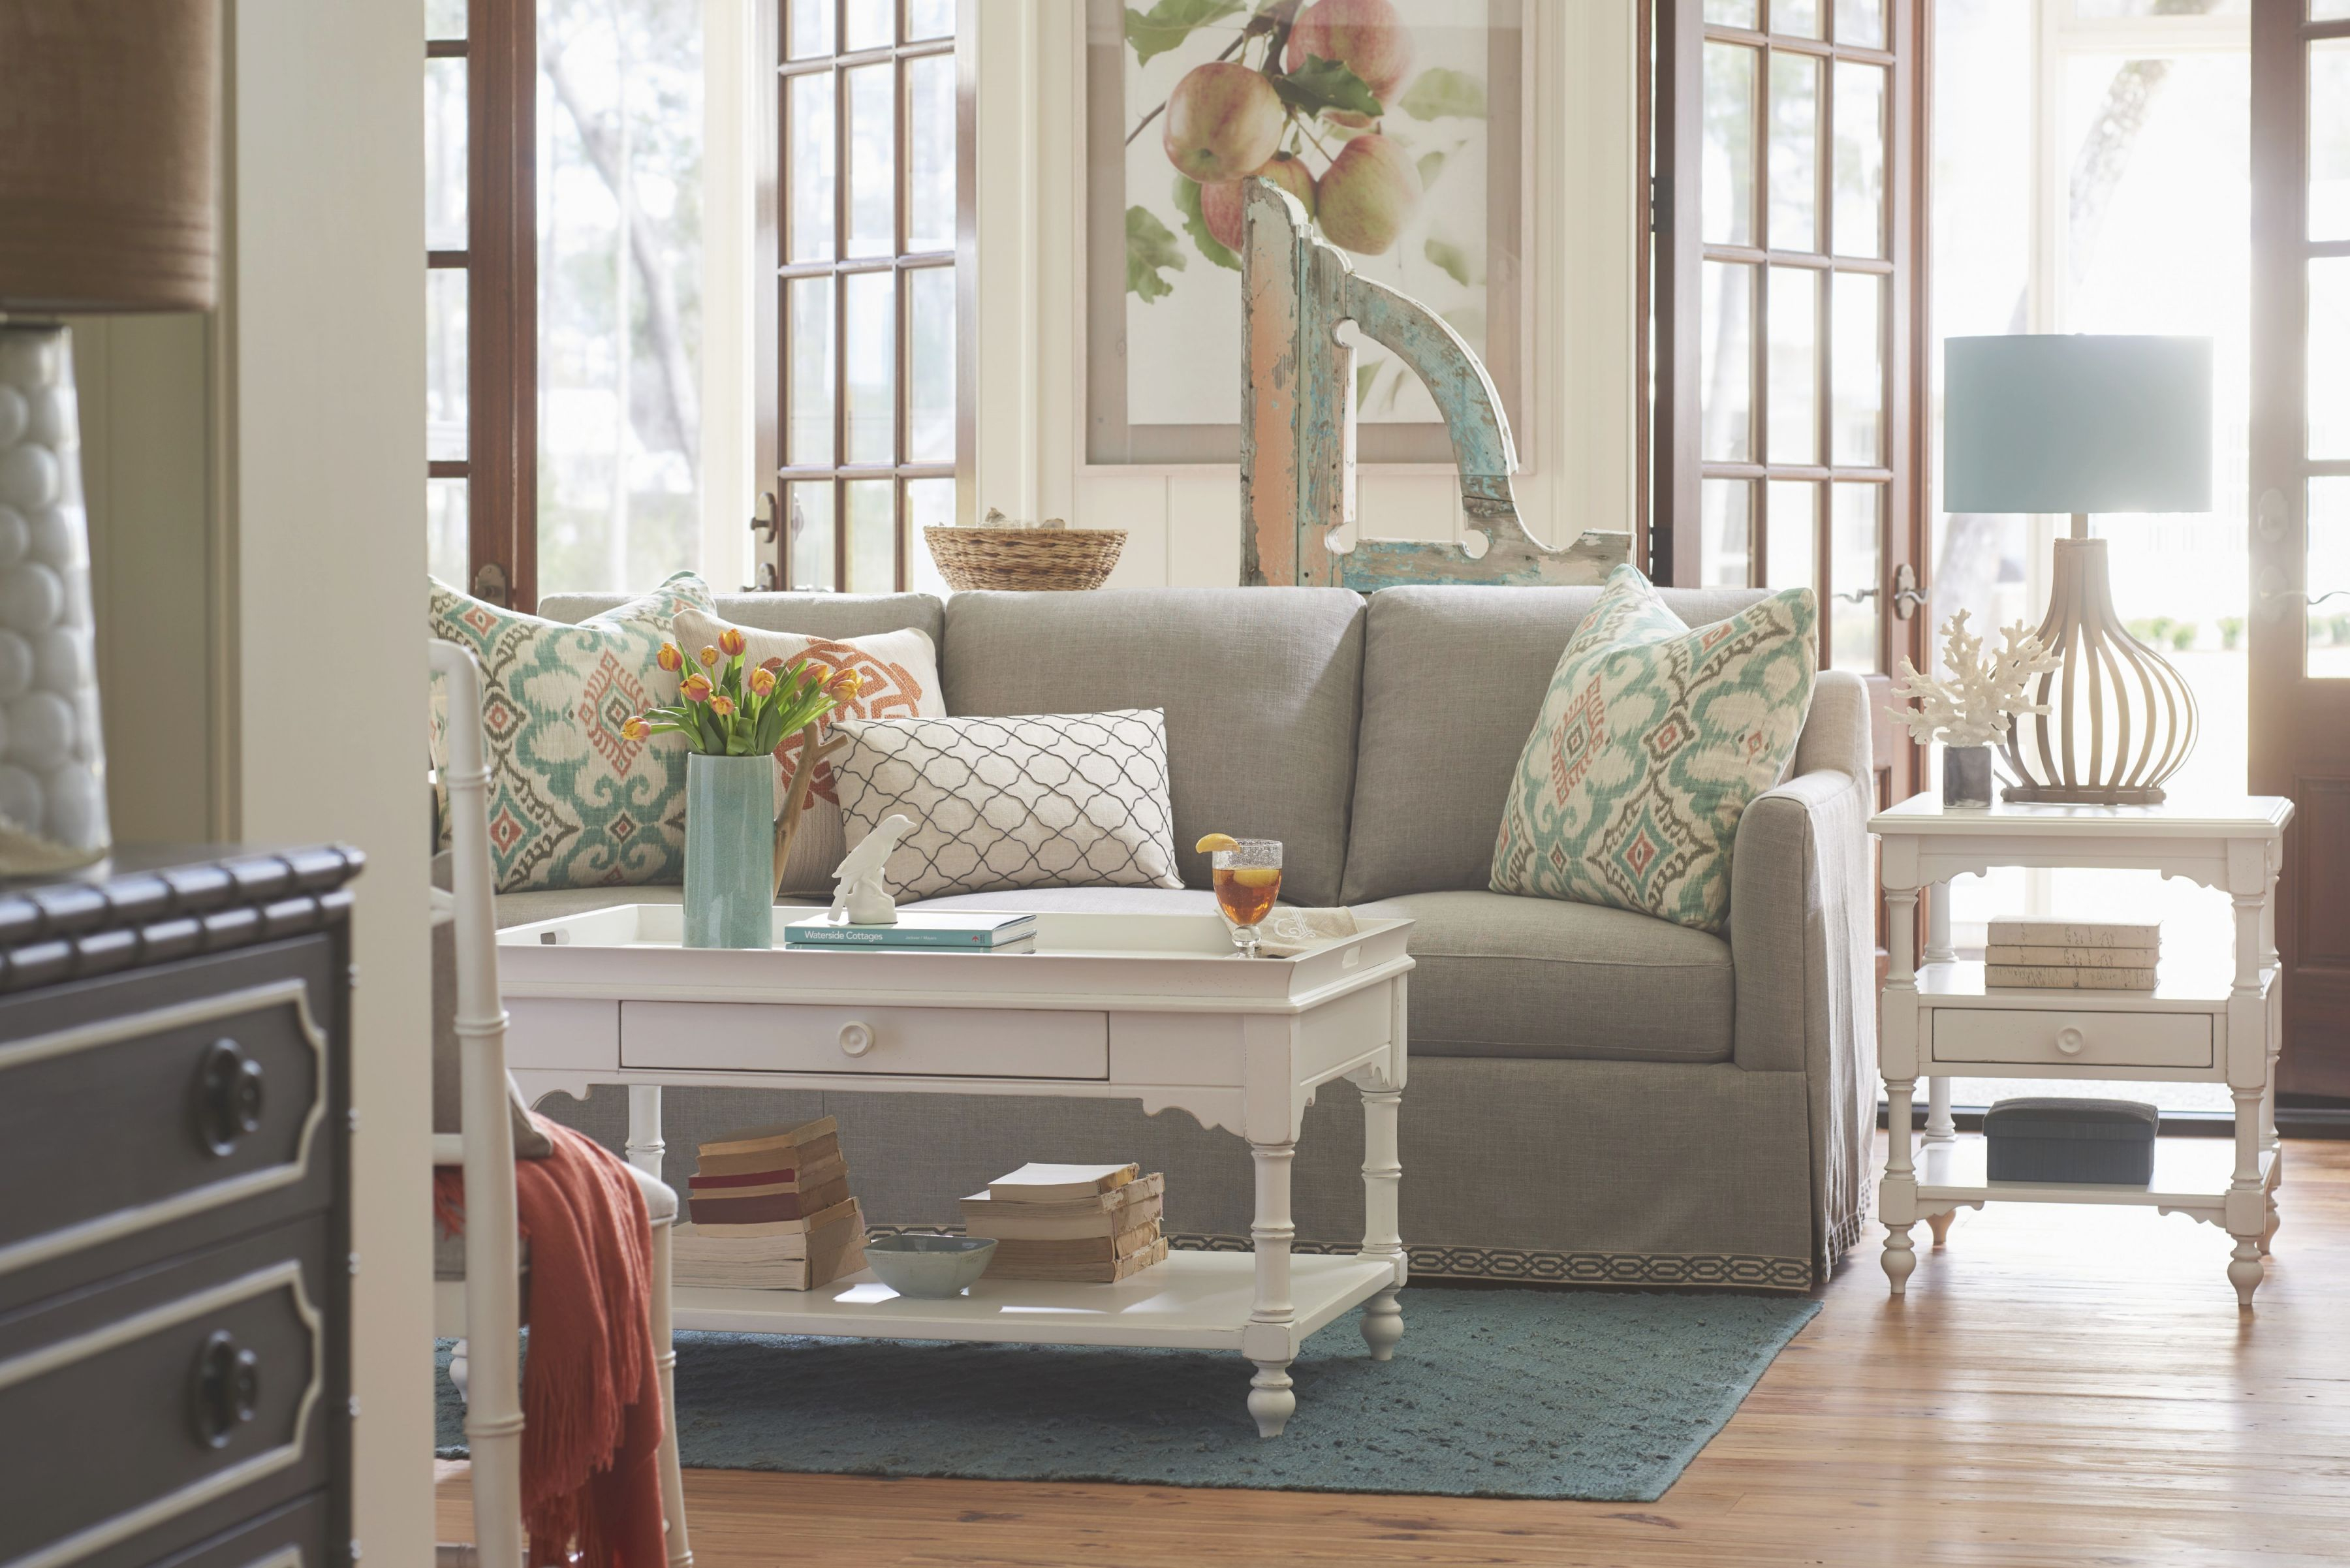 Elegant Paula Deen Living Room Furniture - Awesome Decors